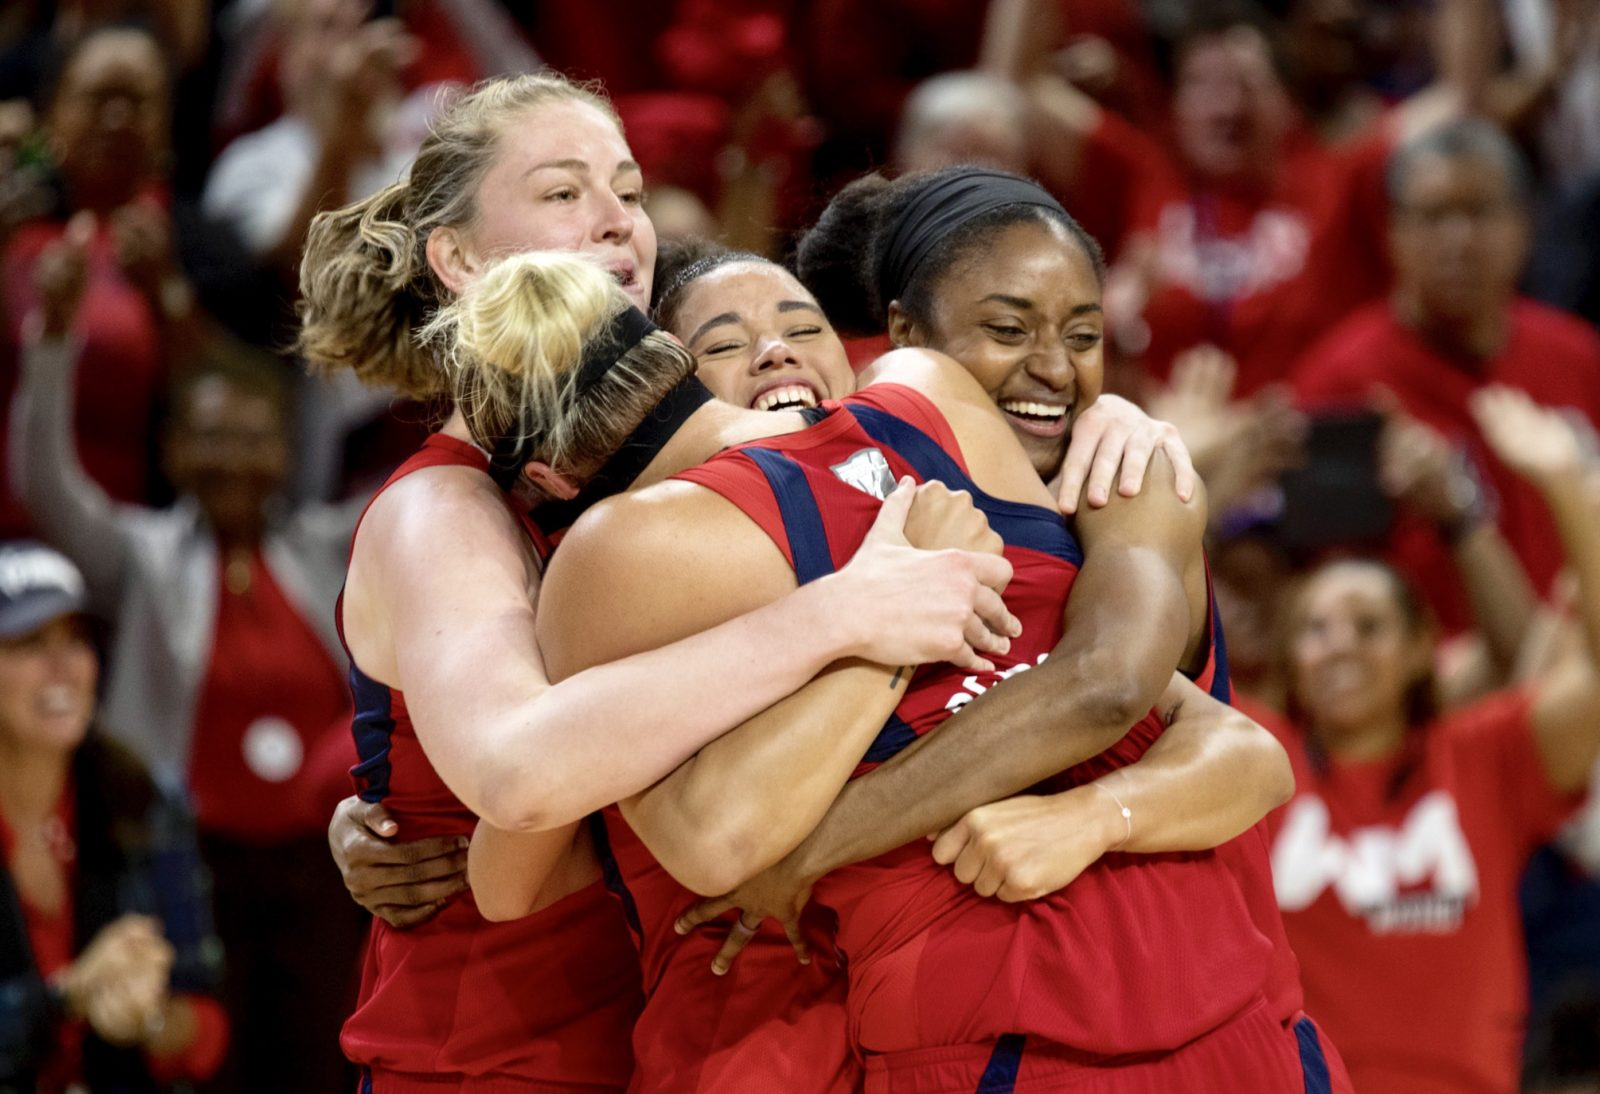 Washington Mystics, 2019 WNBA Champs.